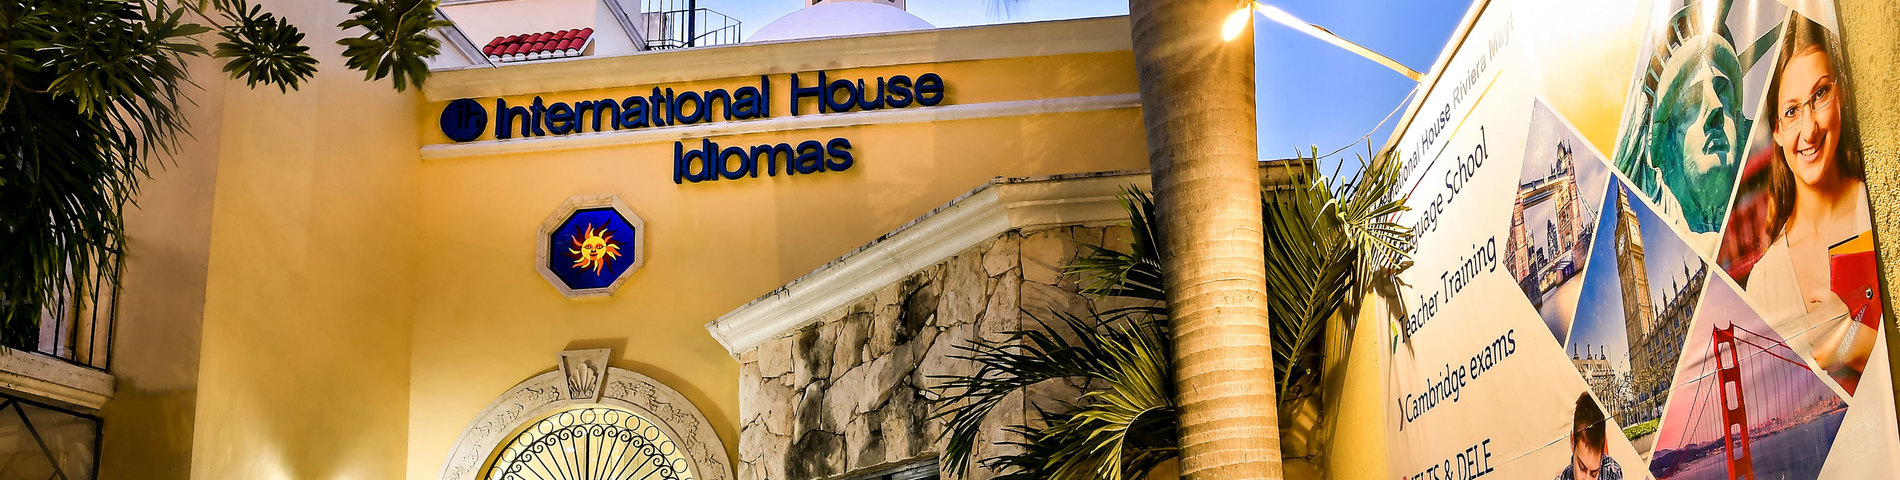 International House - Riviera Maya bilde 1